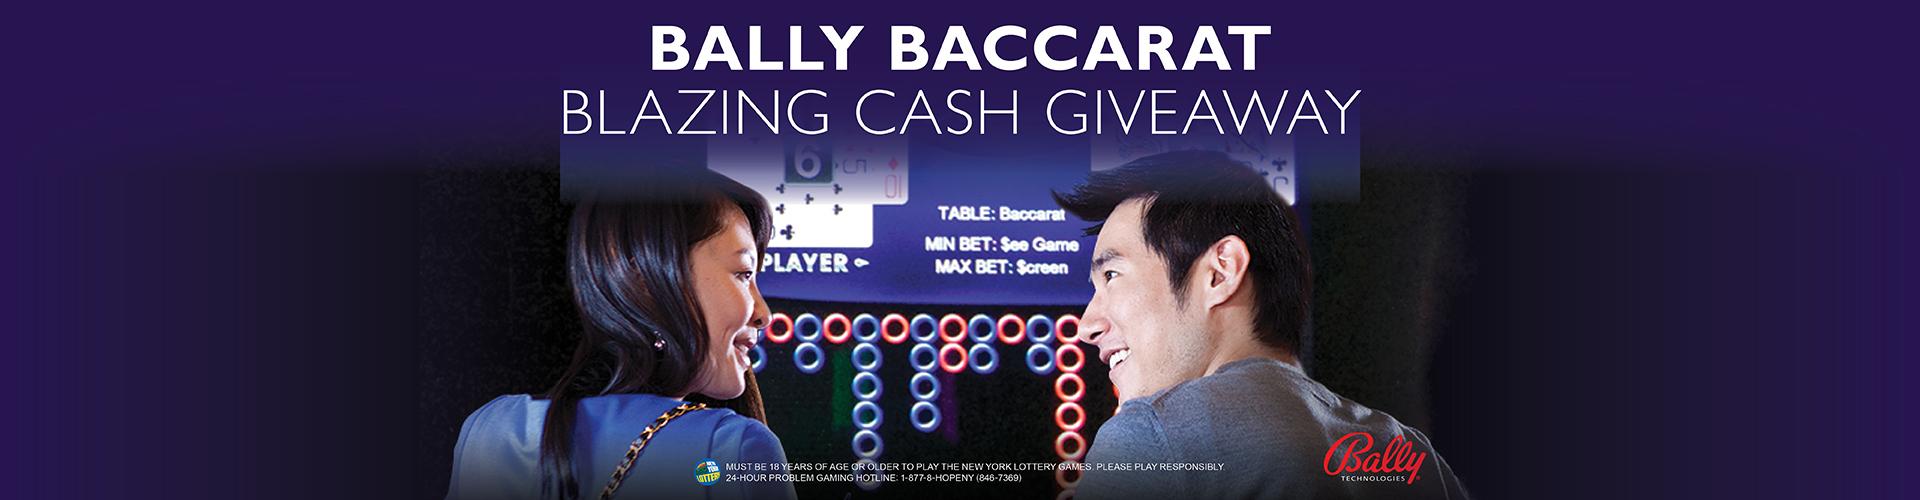 Bally Baccarat Blazing Cash